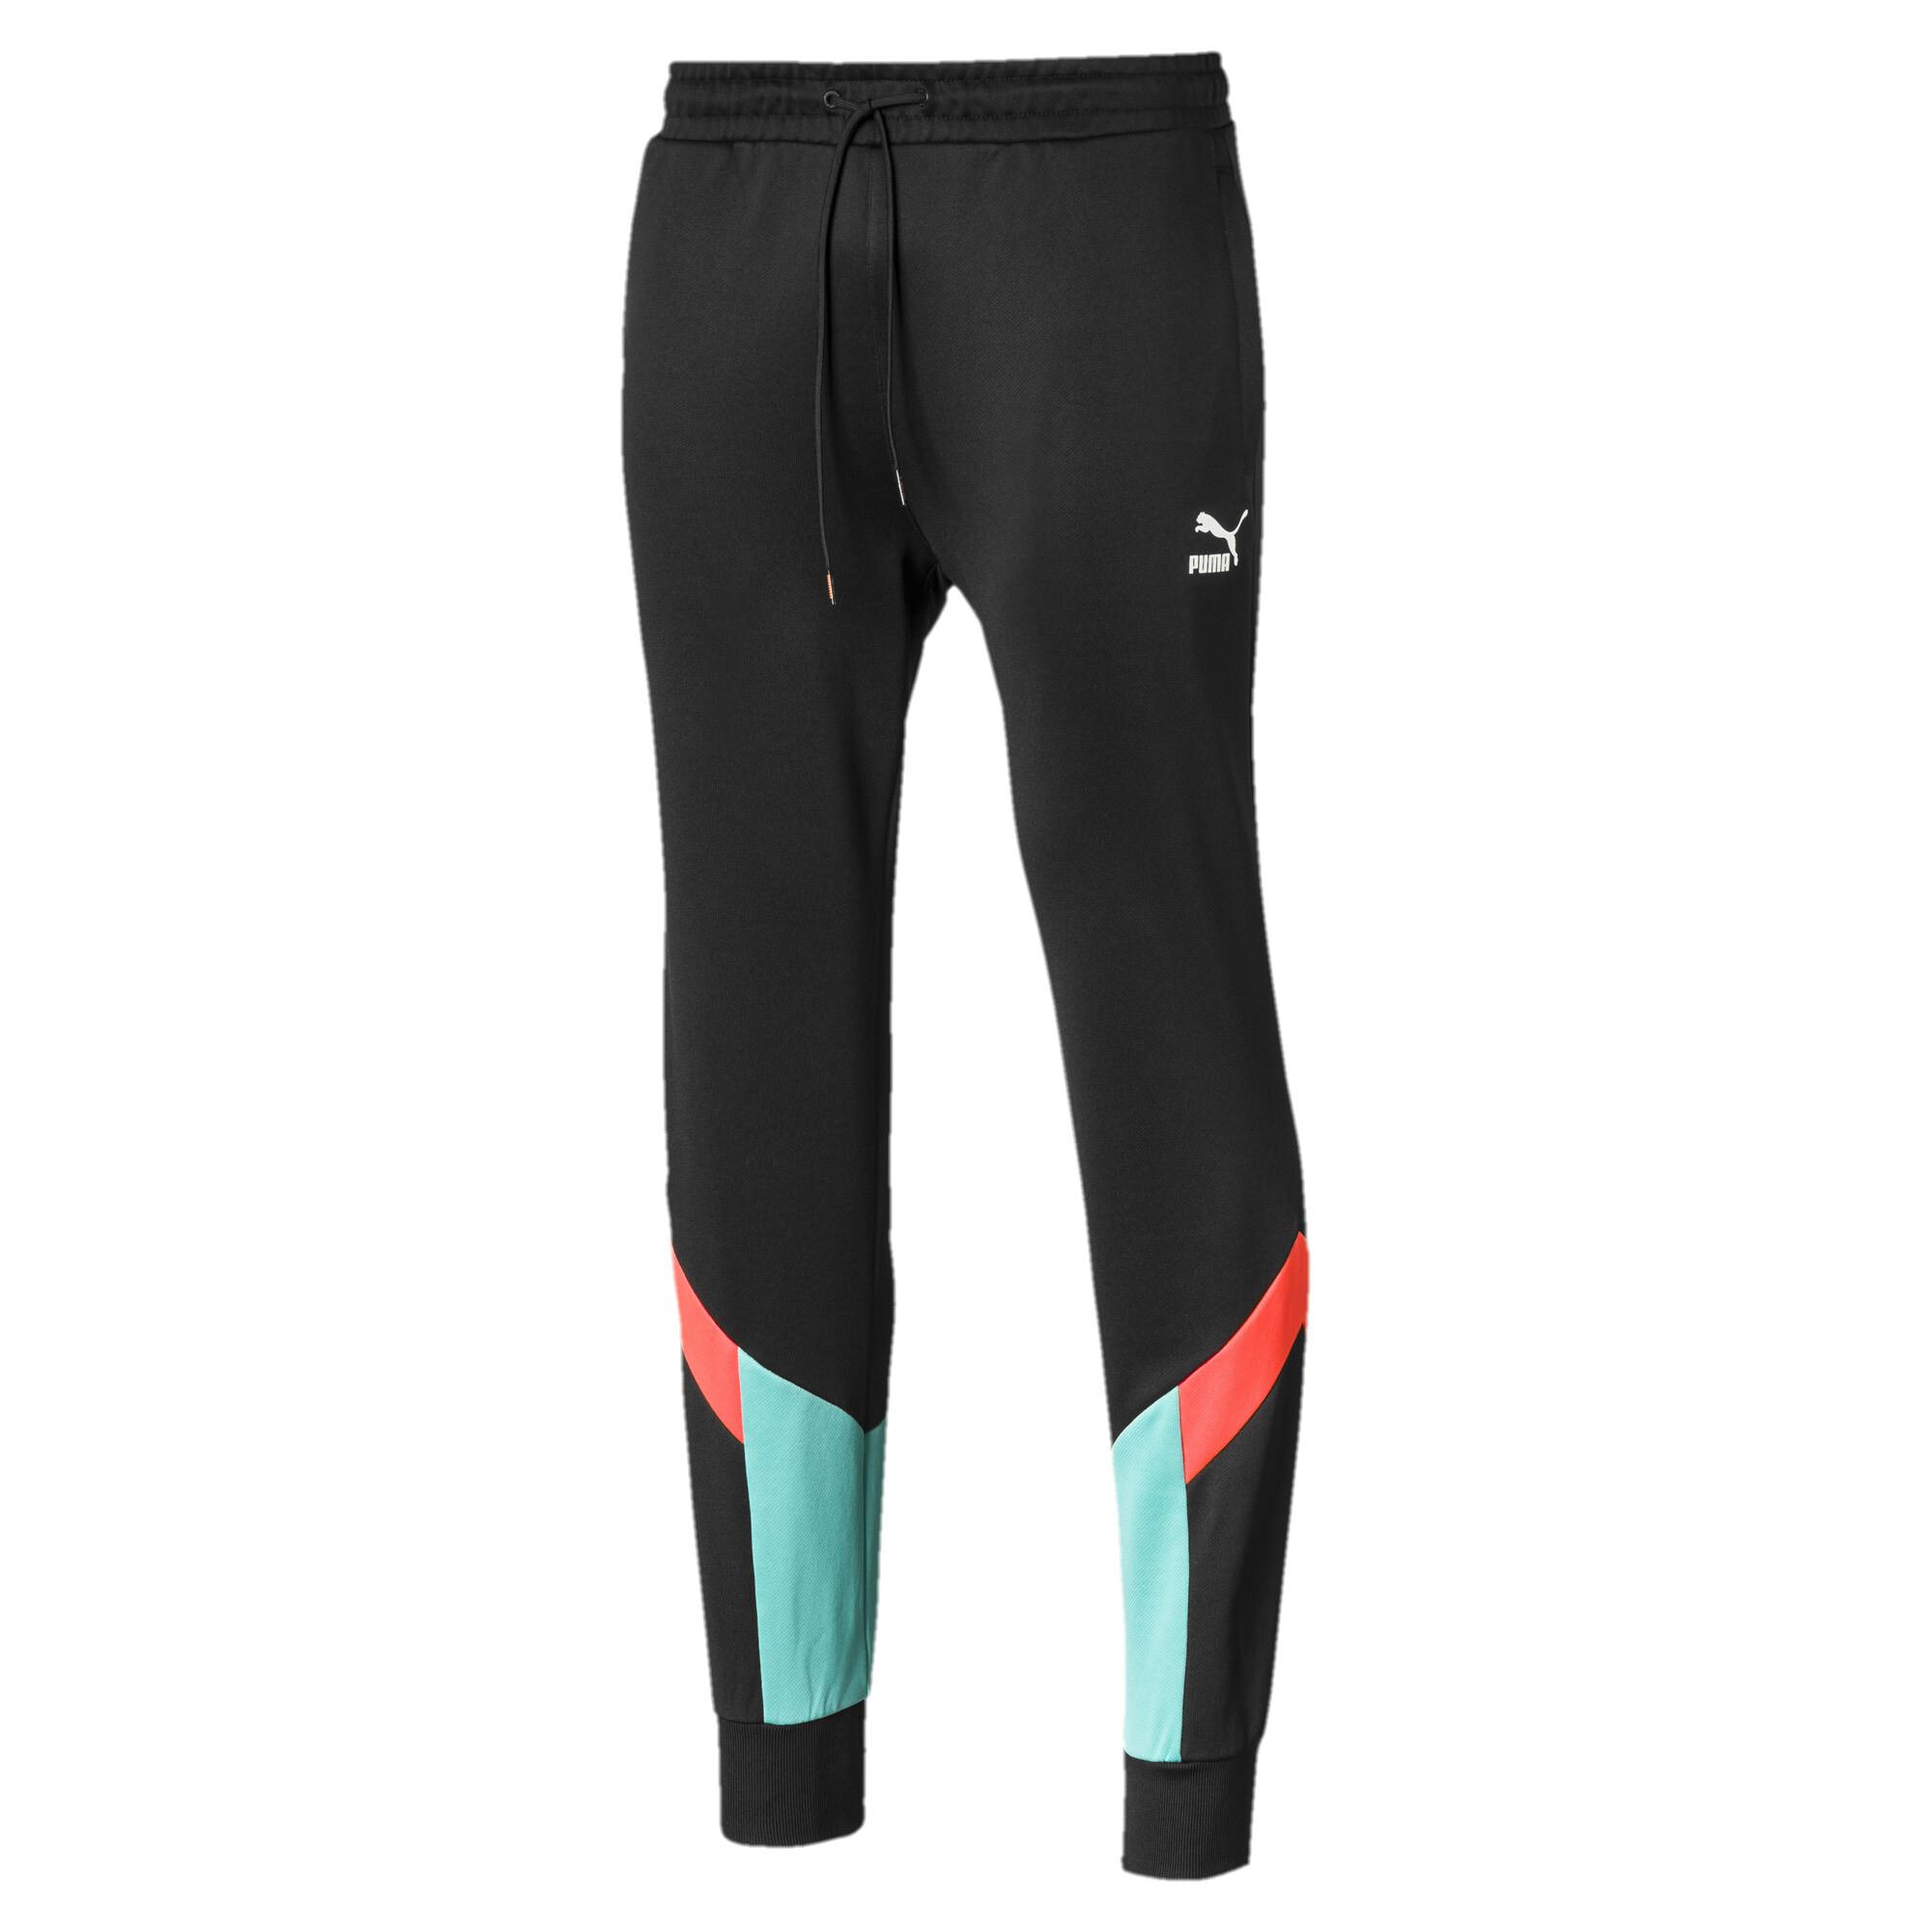 PUMA-Iconic-MCS-Men-039-s-Track-Pants-Men-Knitted-Pants-Sport-Classics thumbnail 13